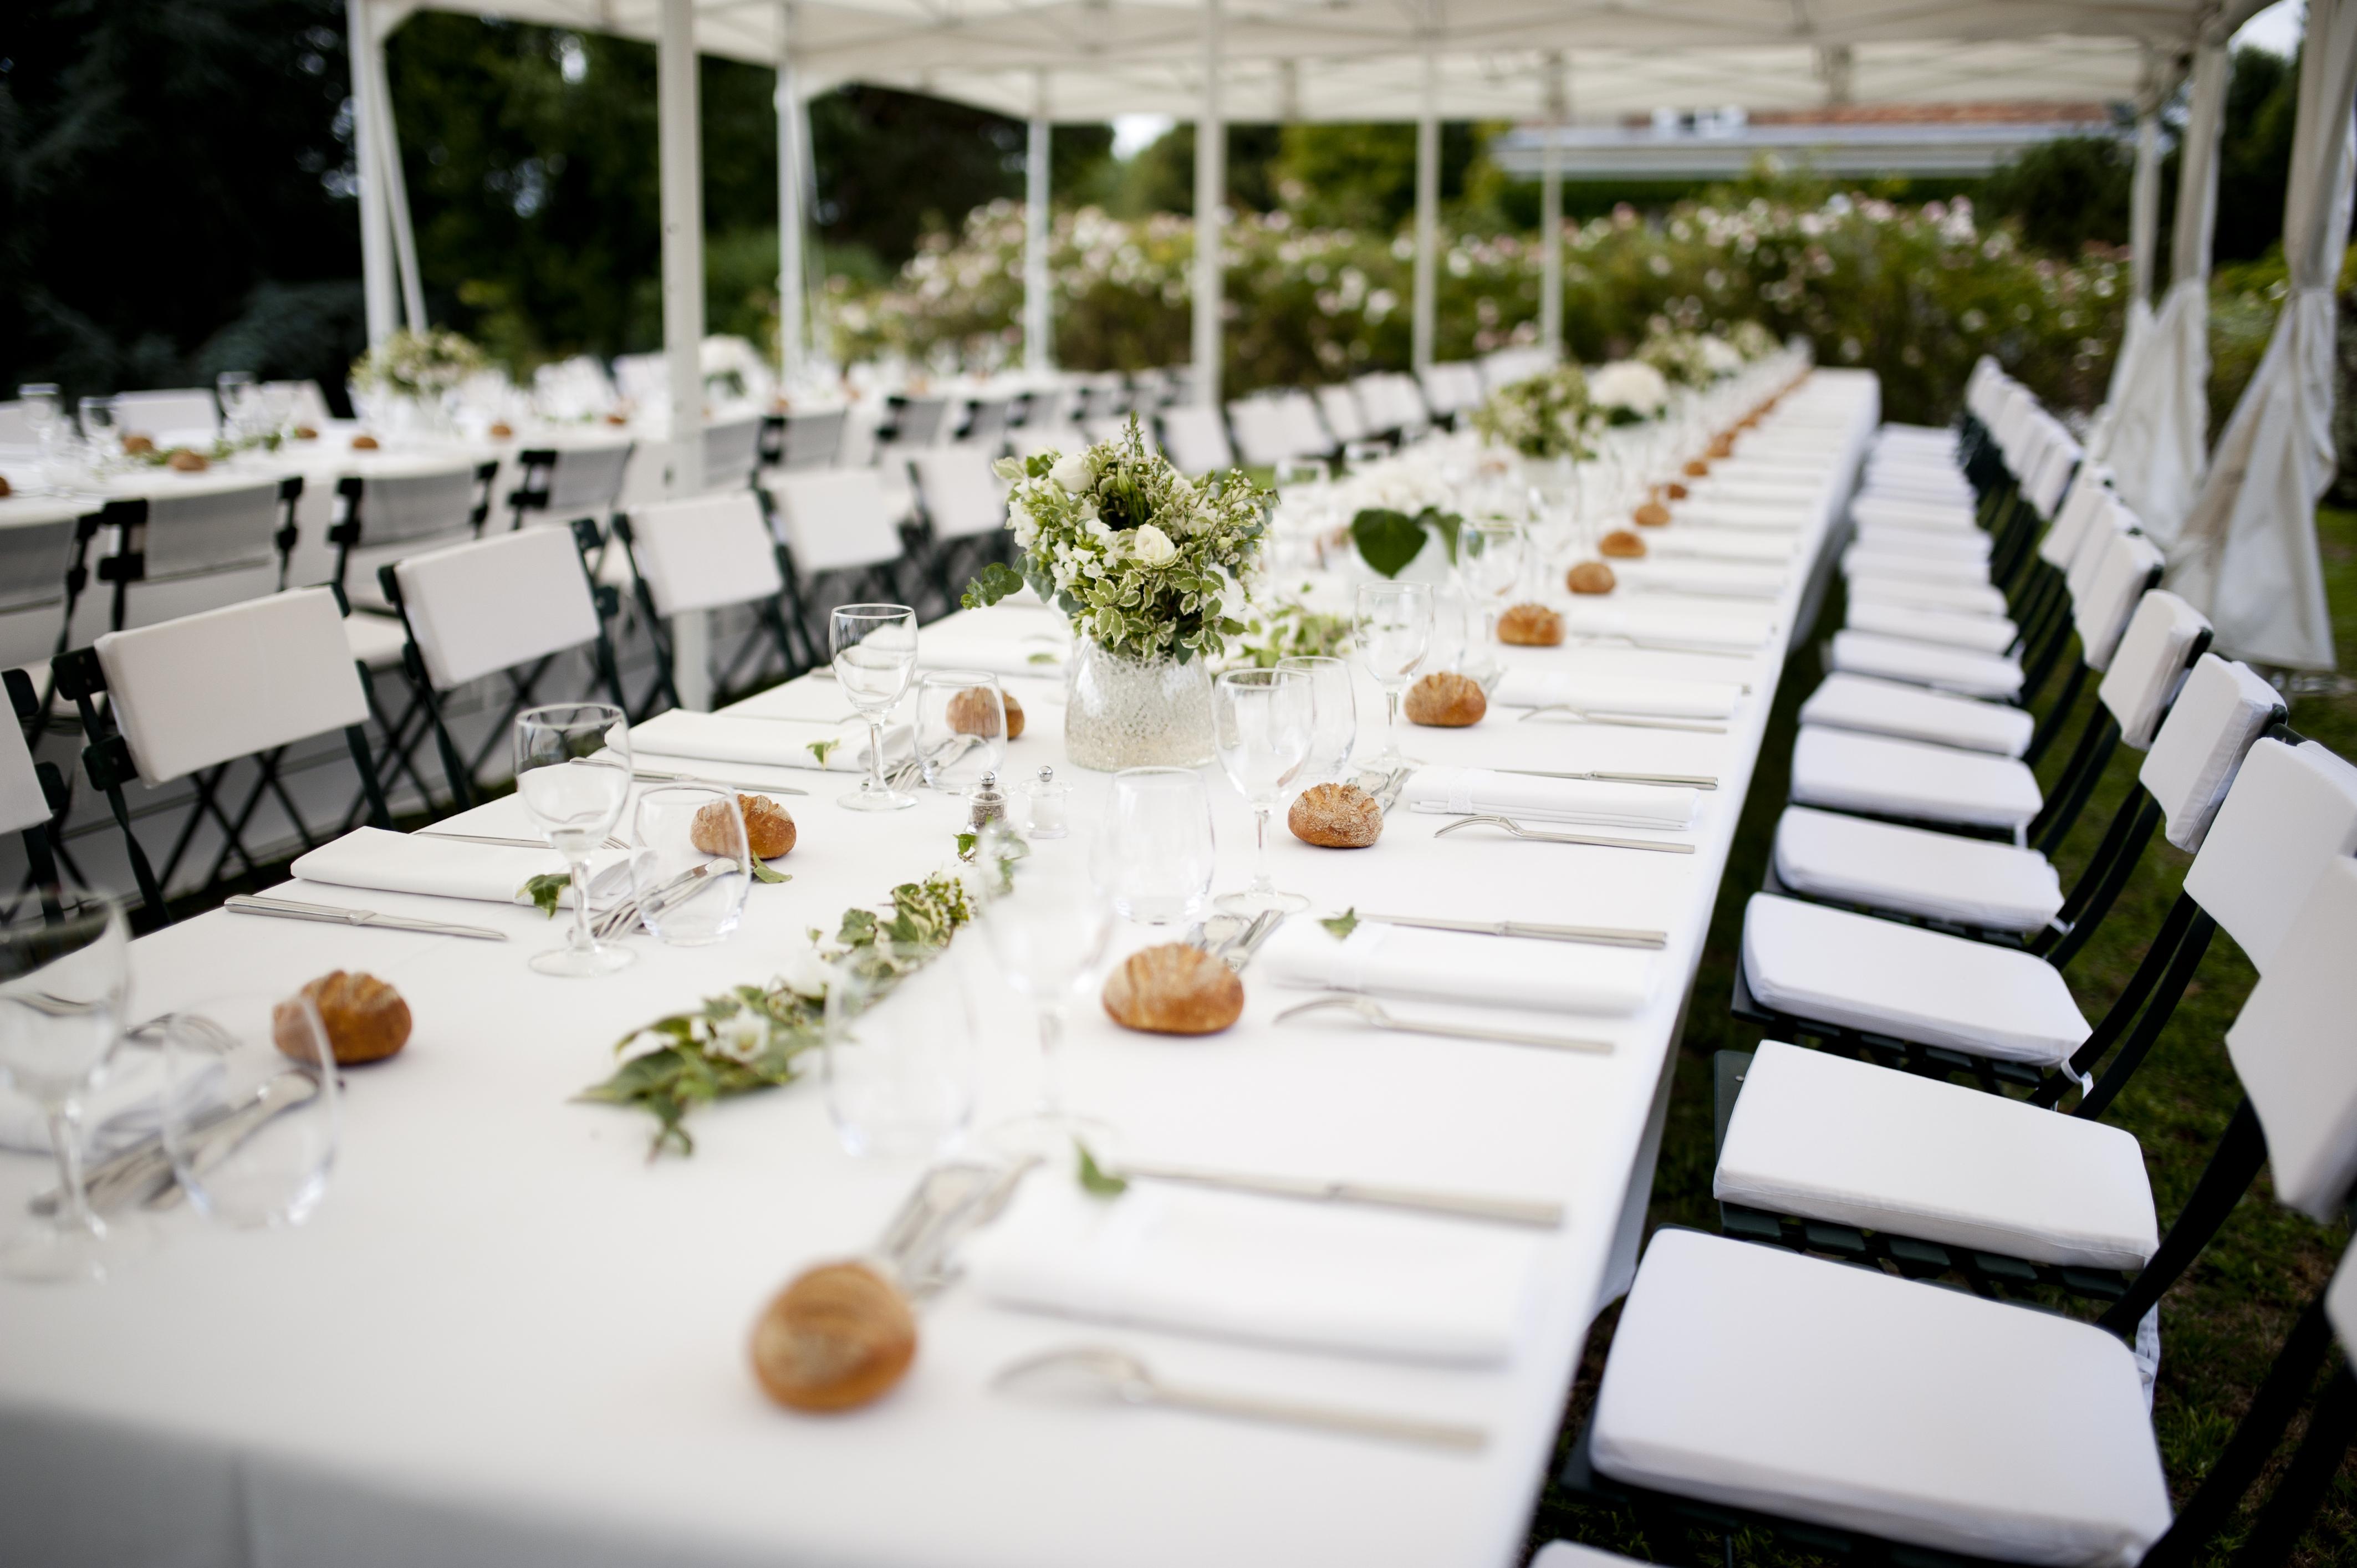 mariage garden party - Traiteur Yvelines - Délices Ephémères